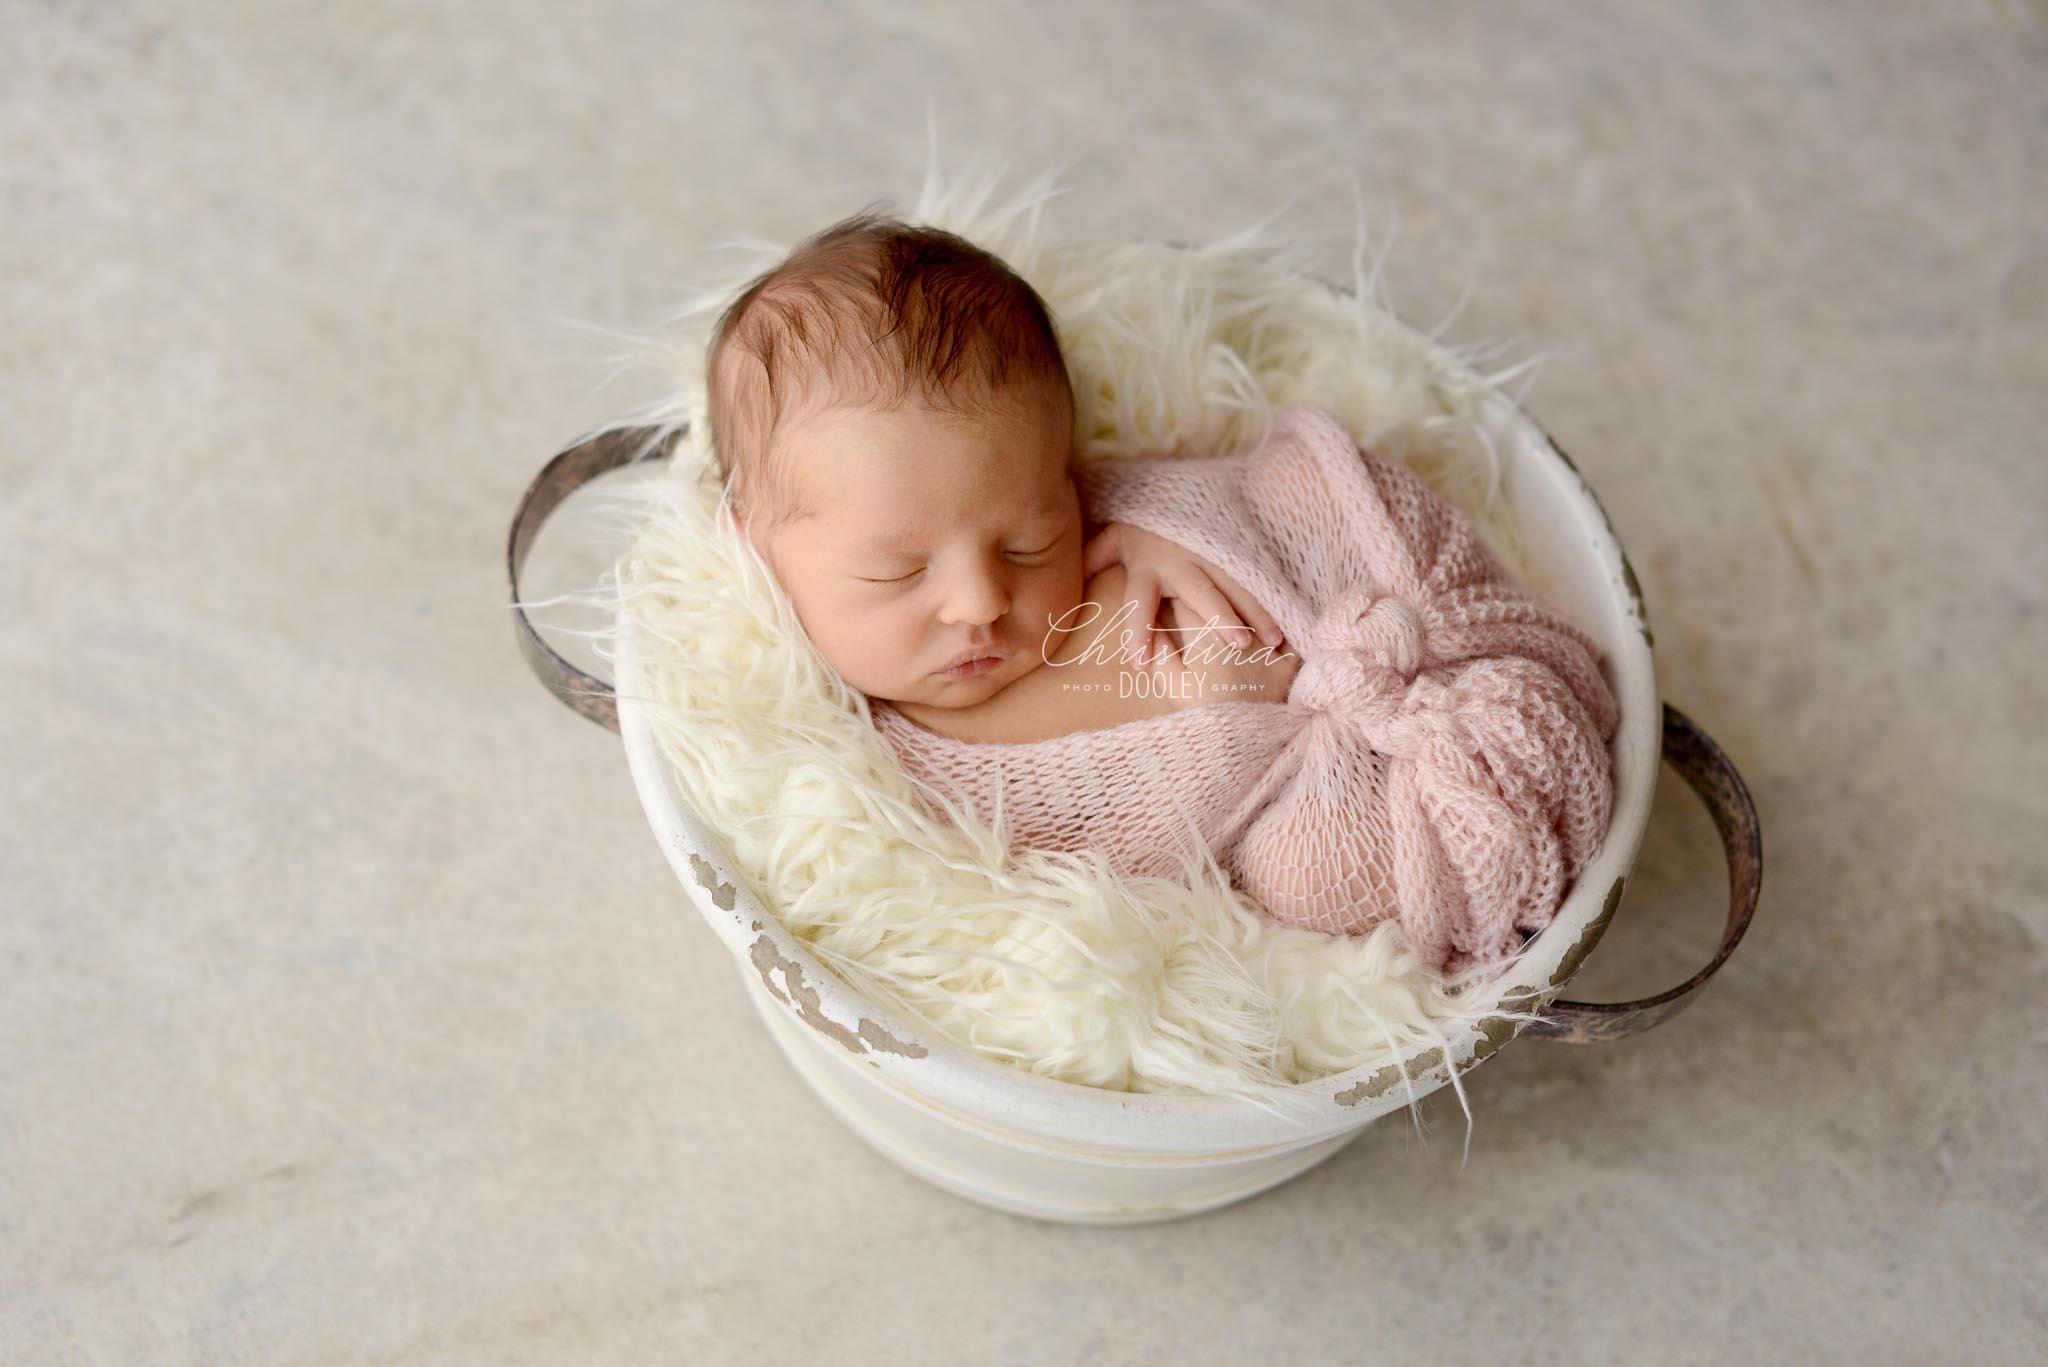 Newborn girl in white bucket on white marble